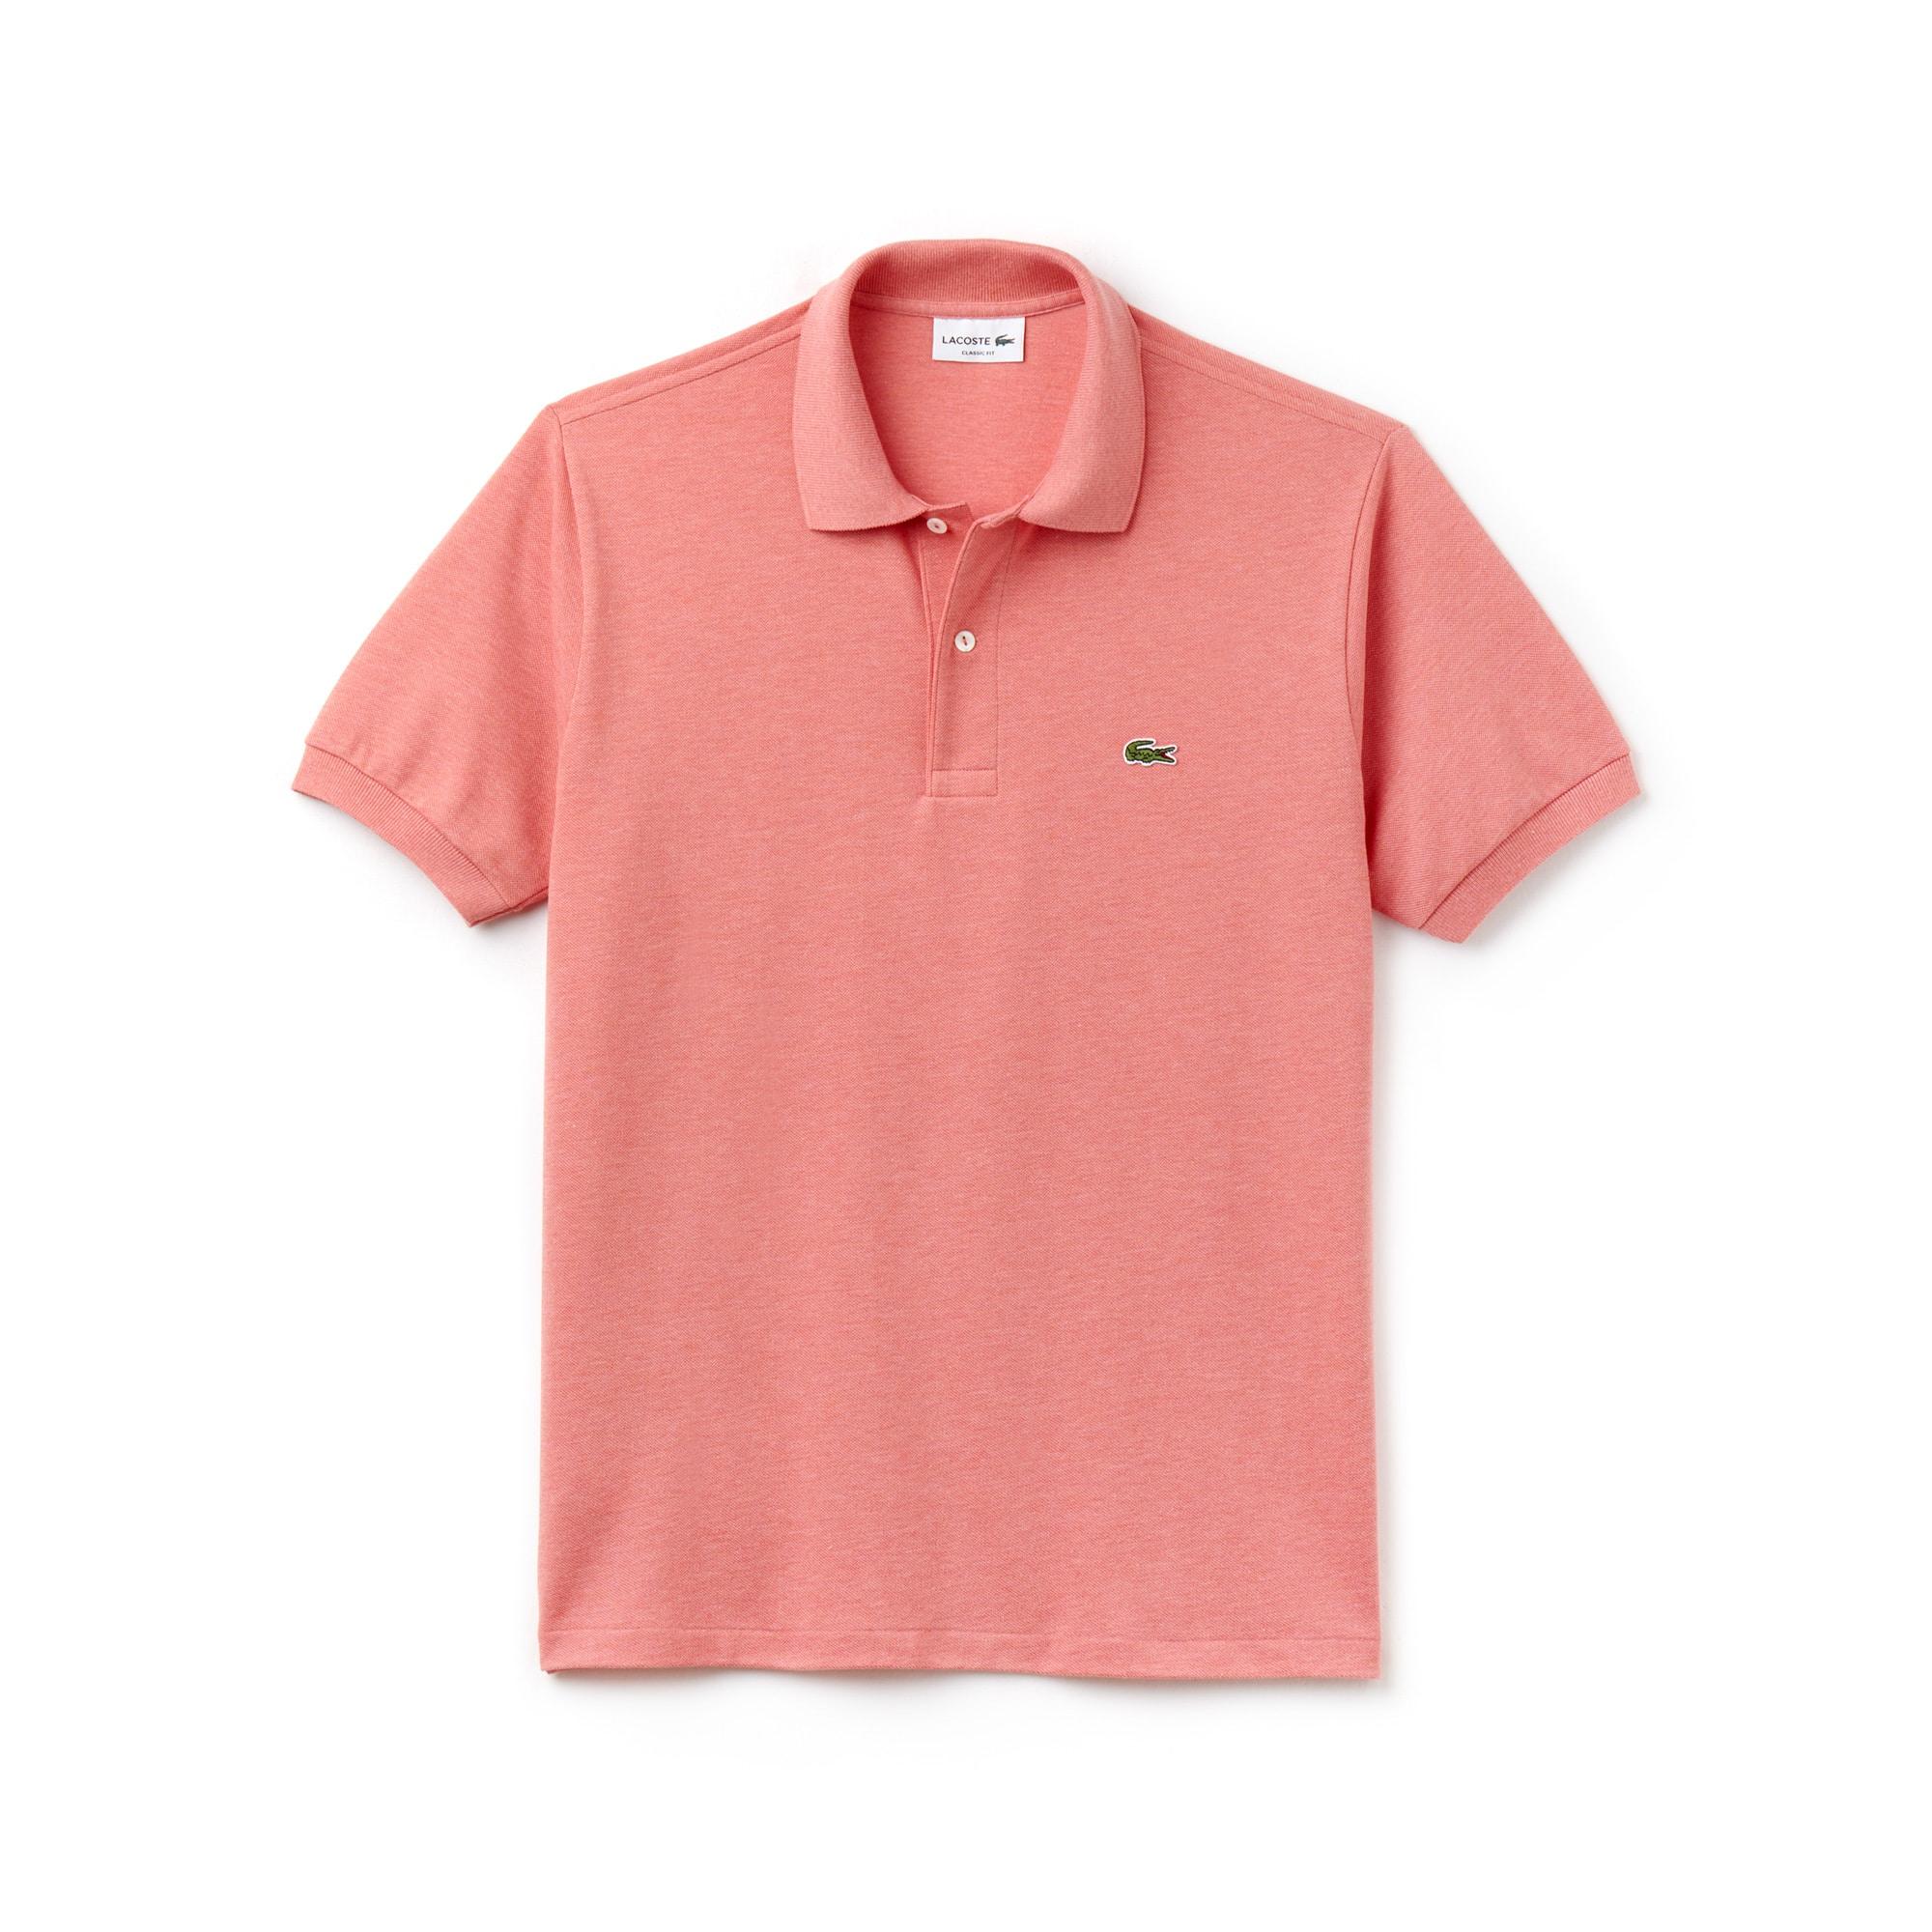 Camisa Polo Lacoste L.12.12 em Merlim